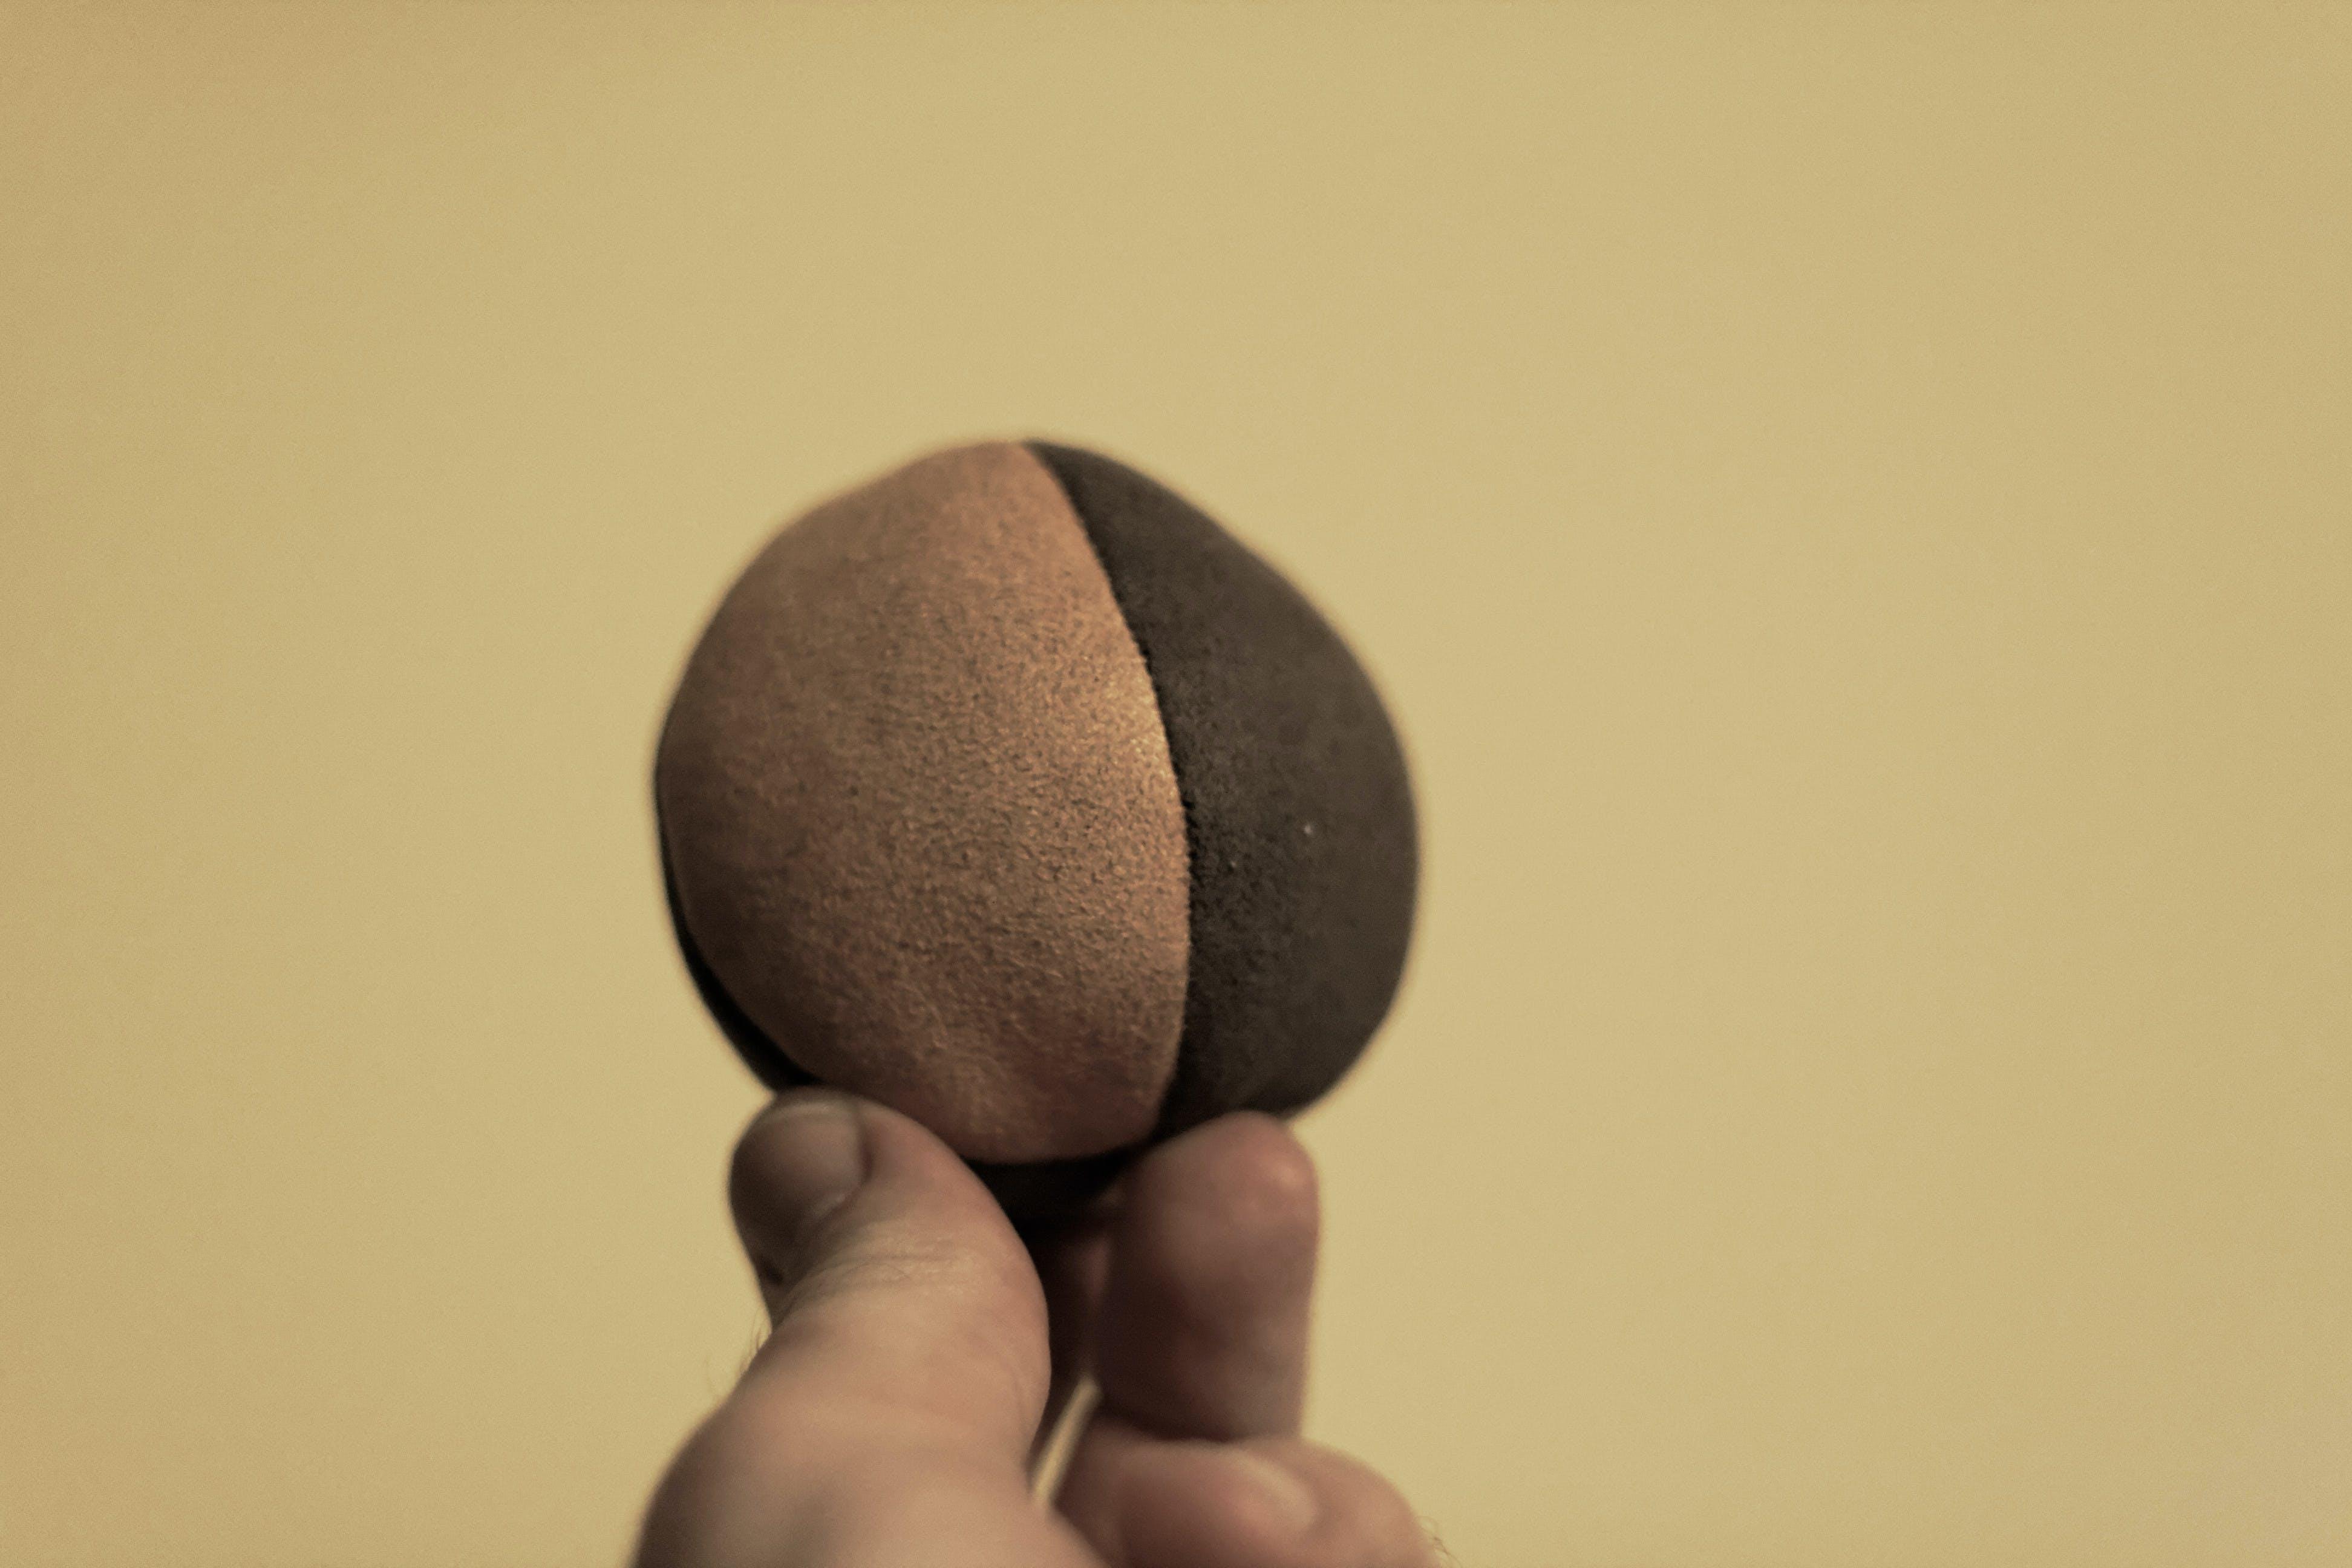 Free stock photo of ball